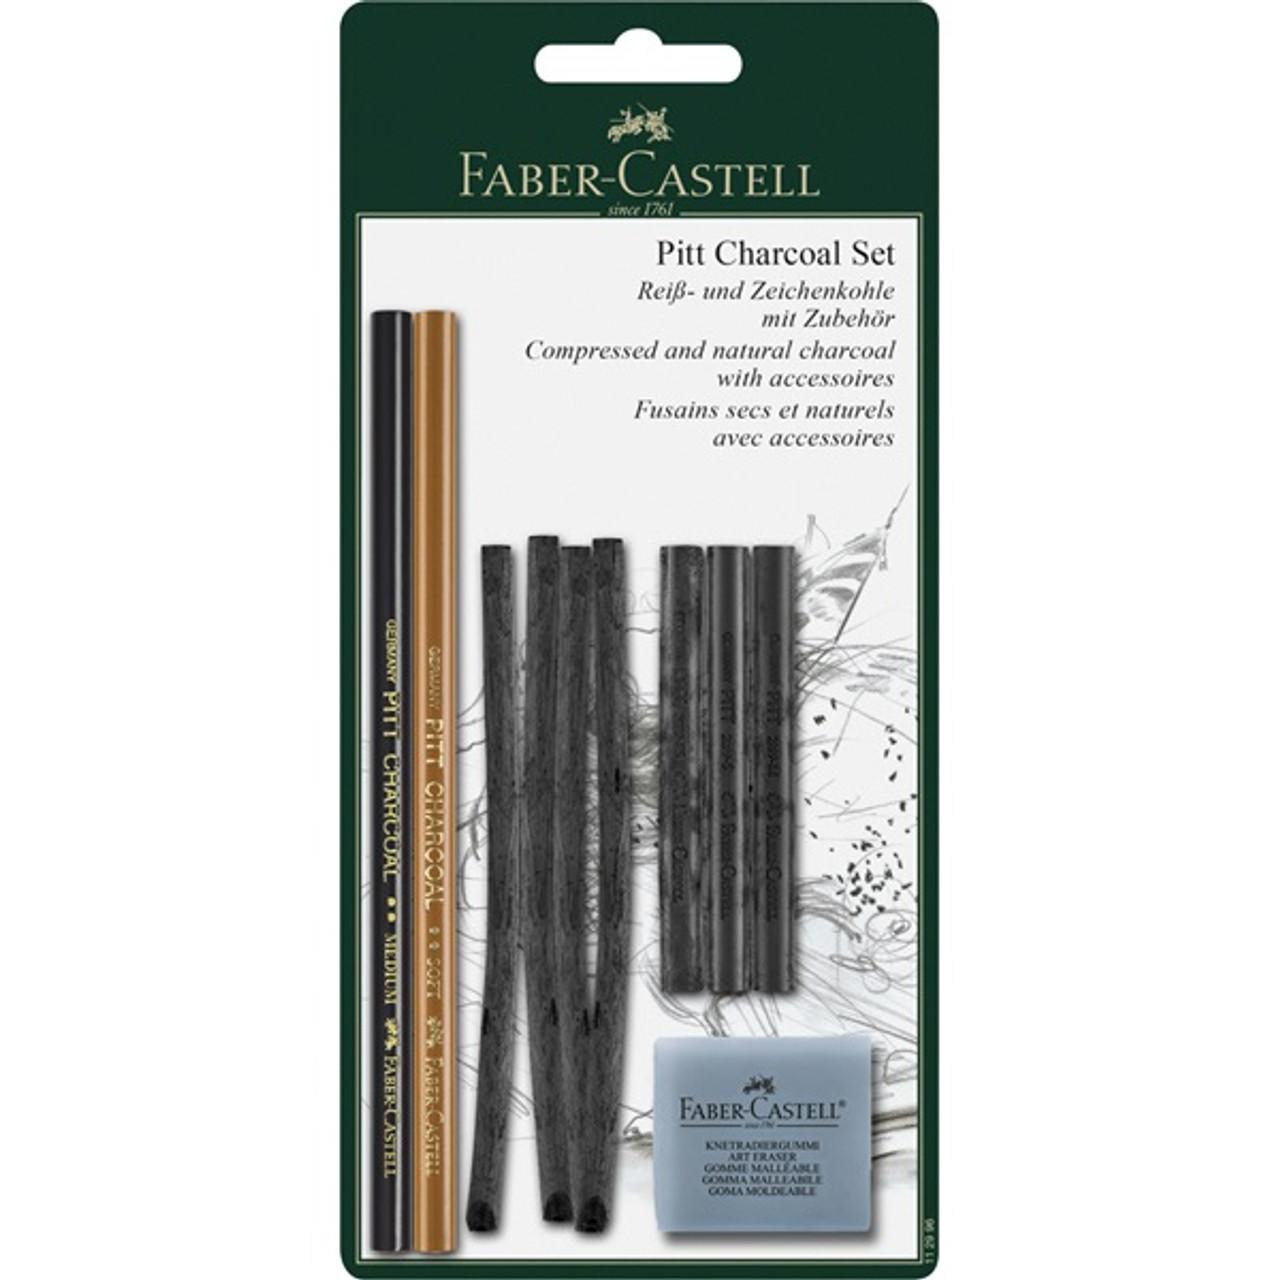 Pitt Charcoal 10pc Set